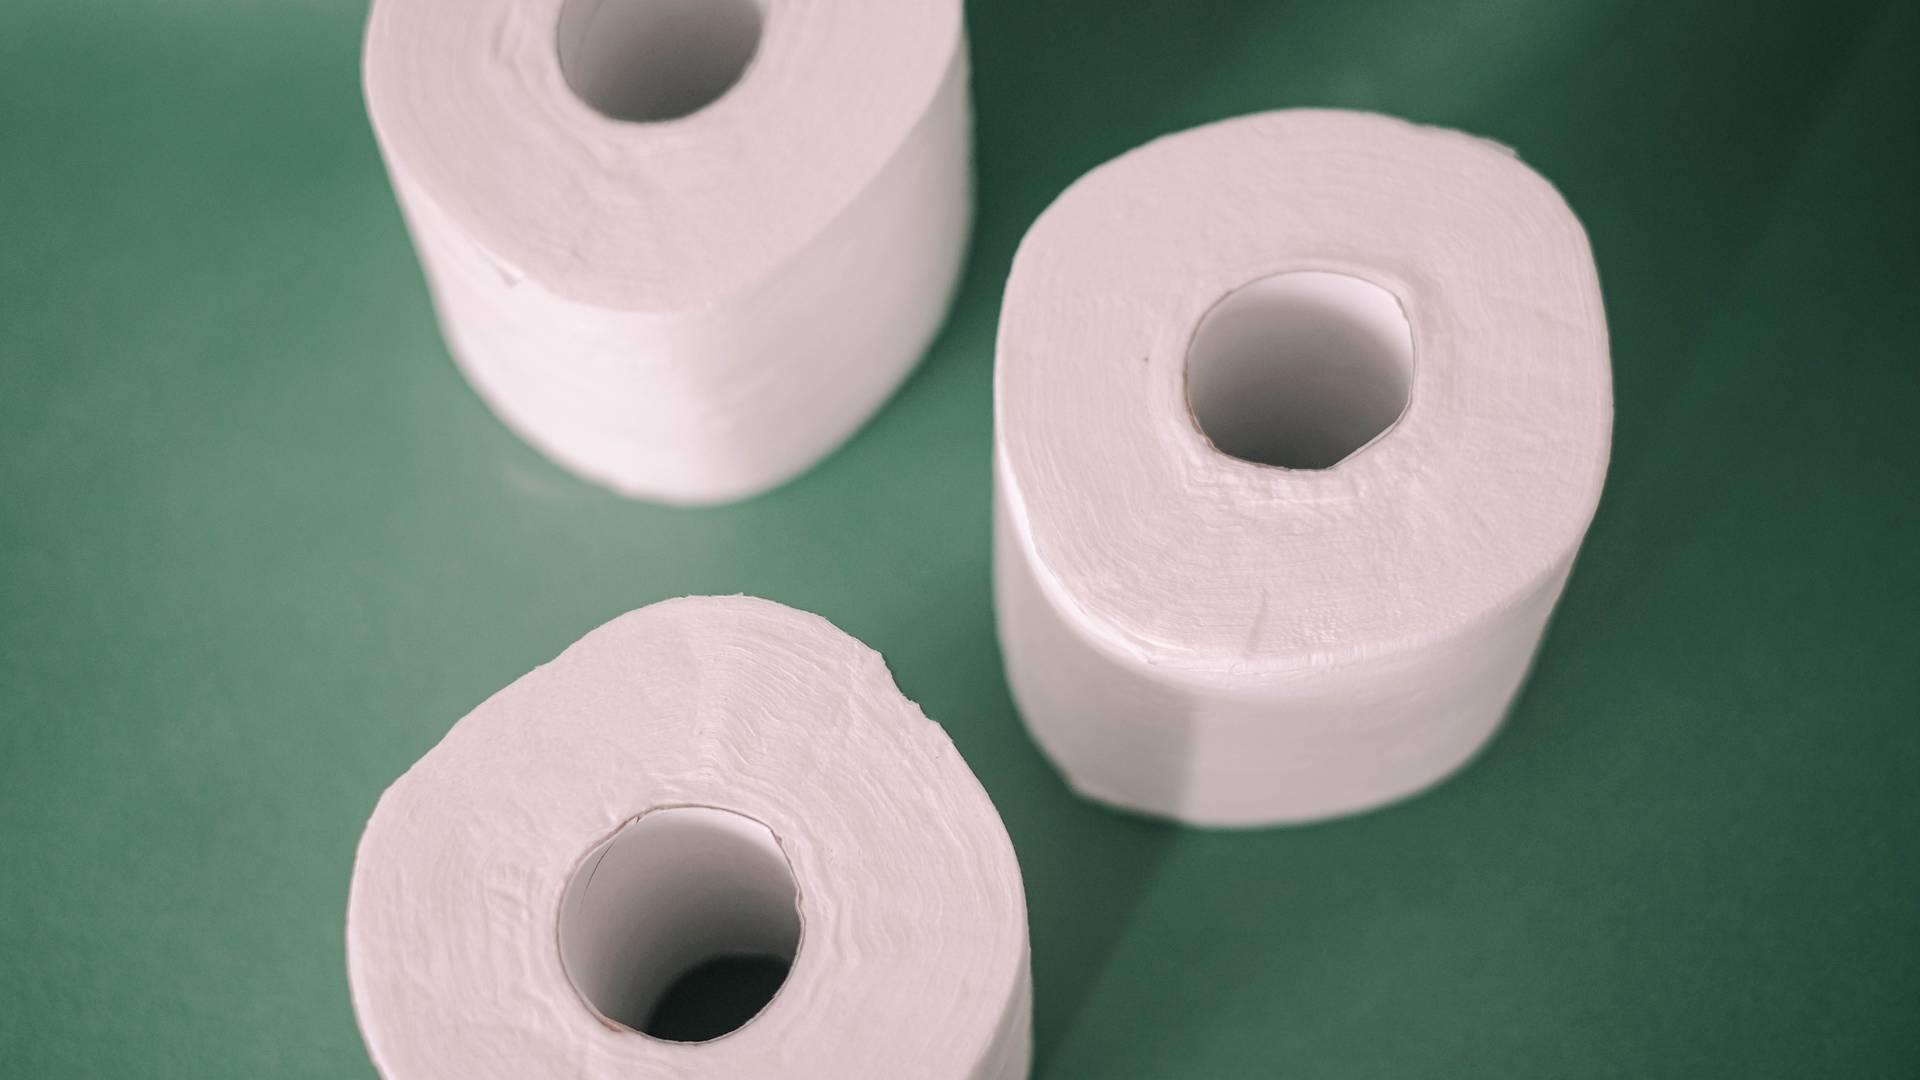 Toilettenpapier Australien